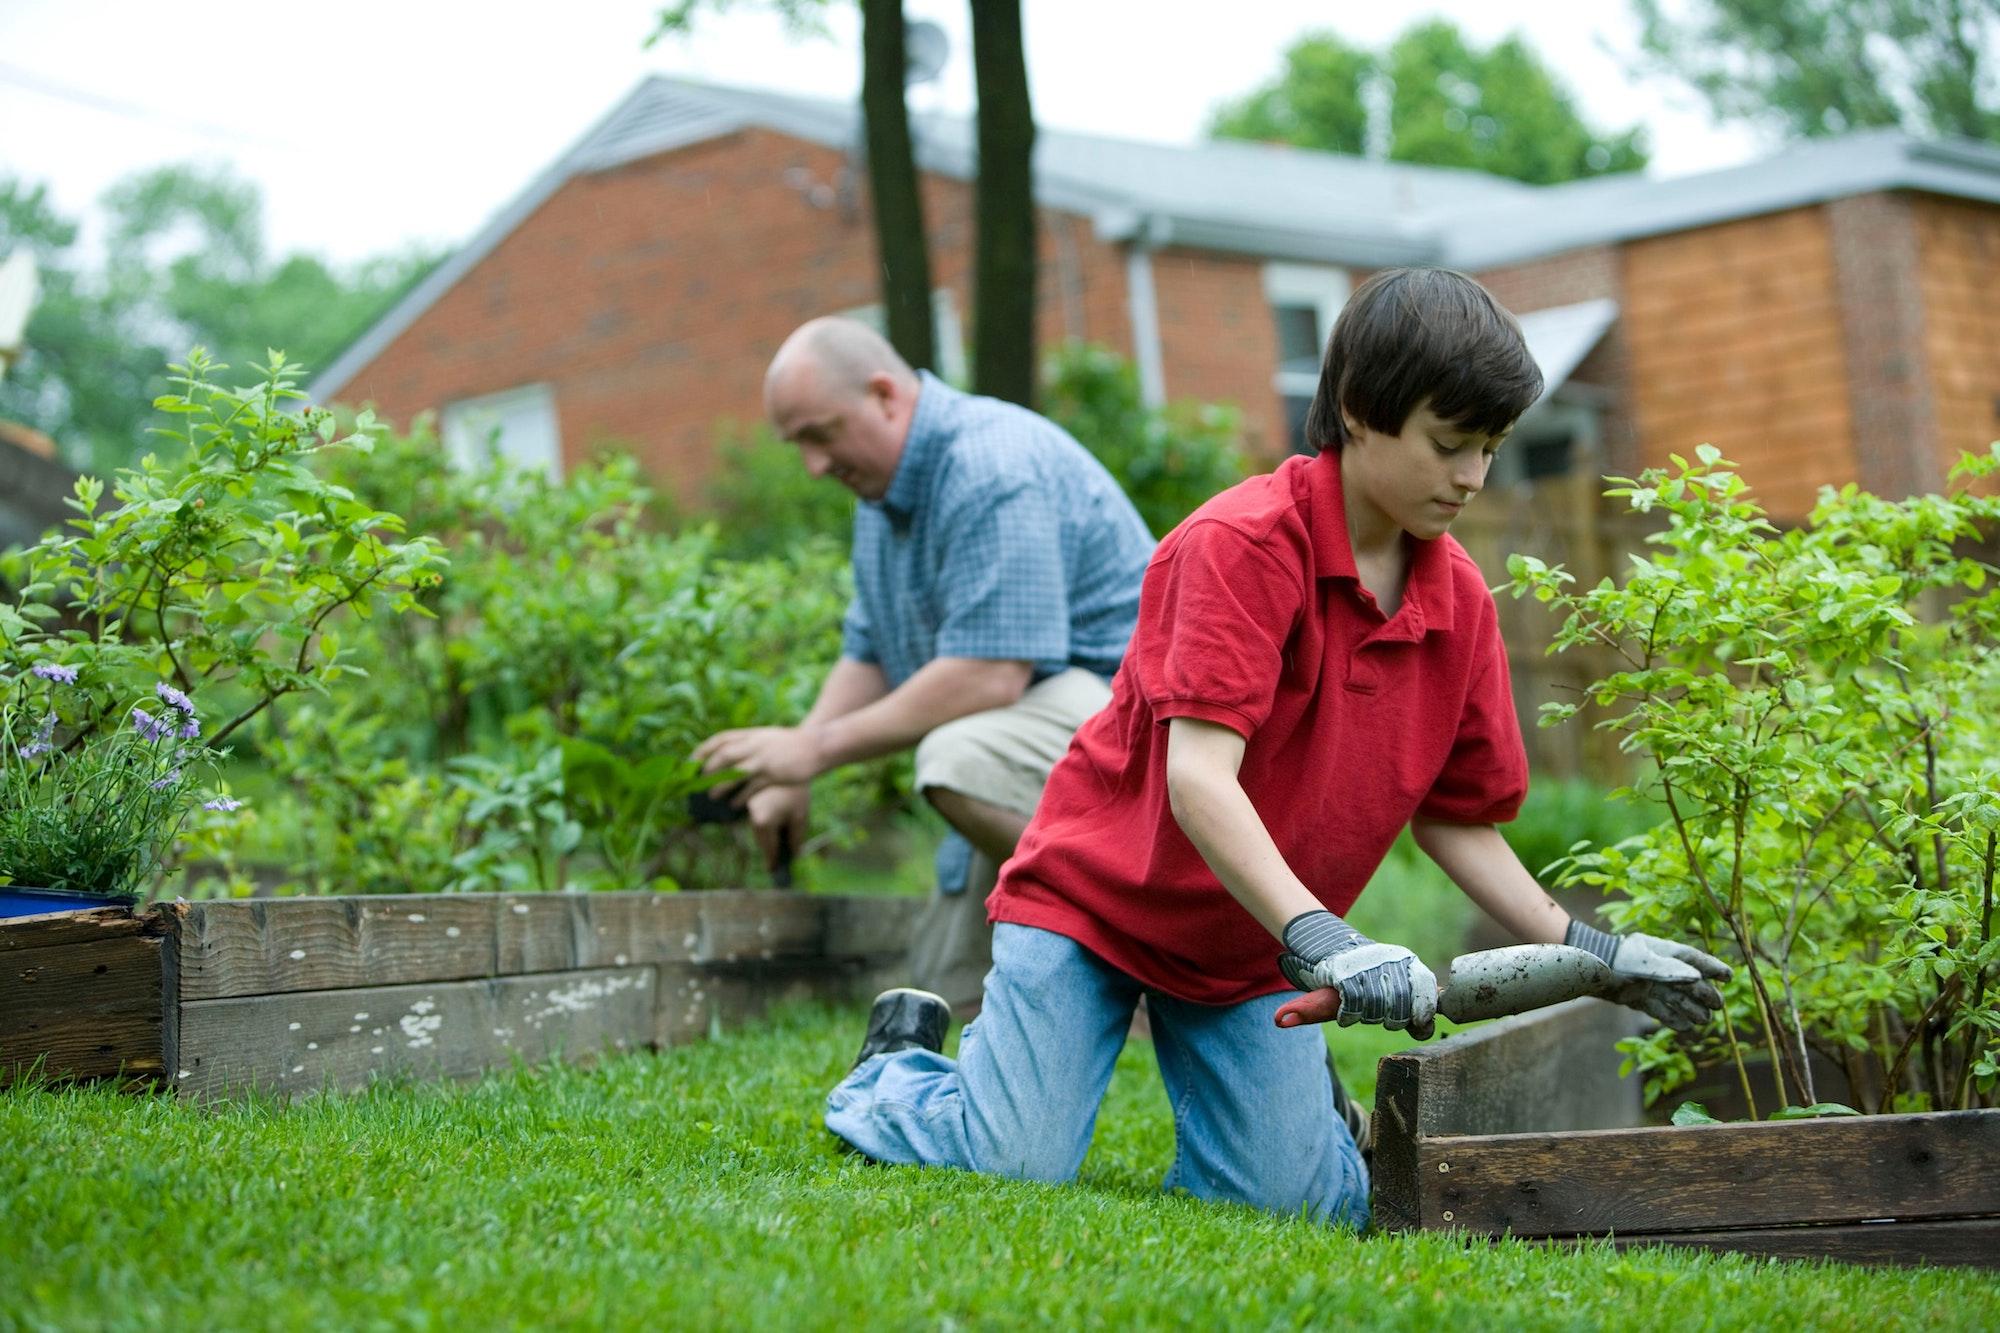 Quality time enjoying your garden